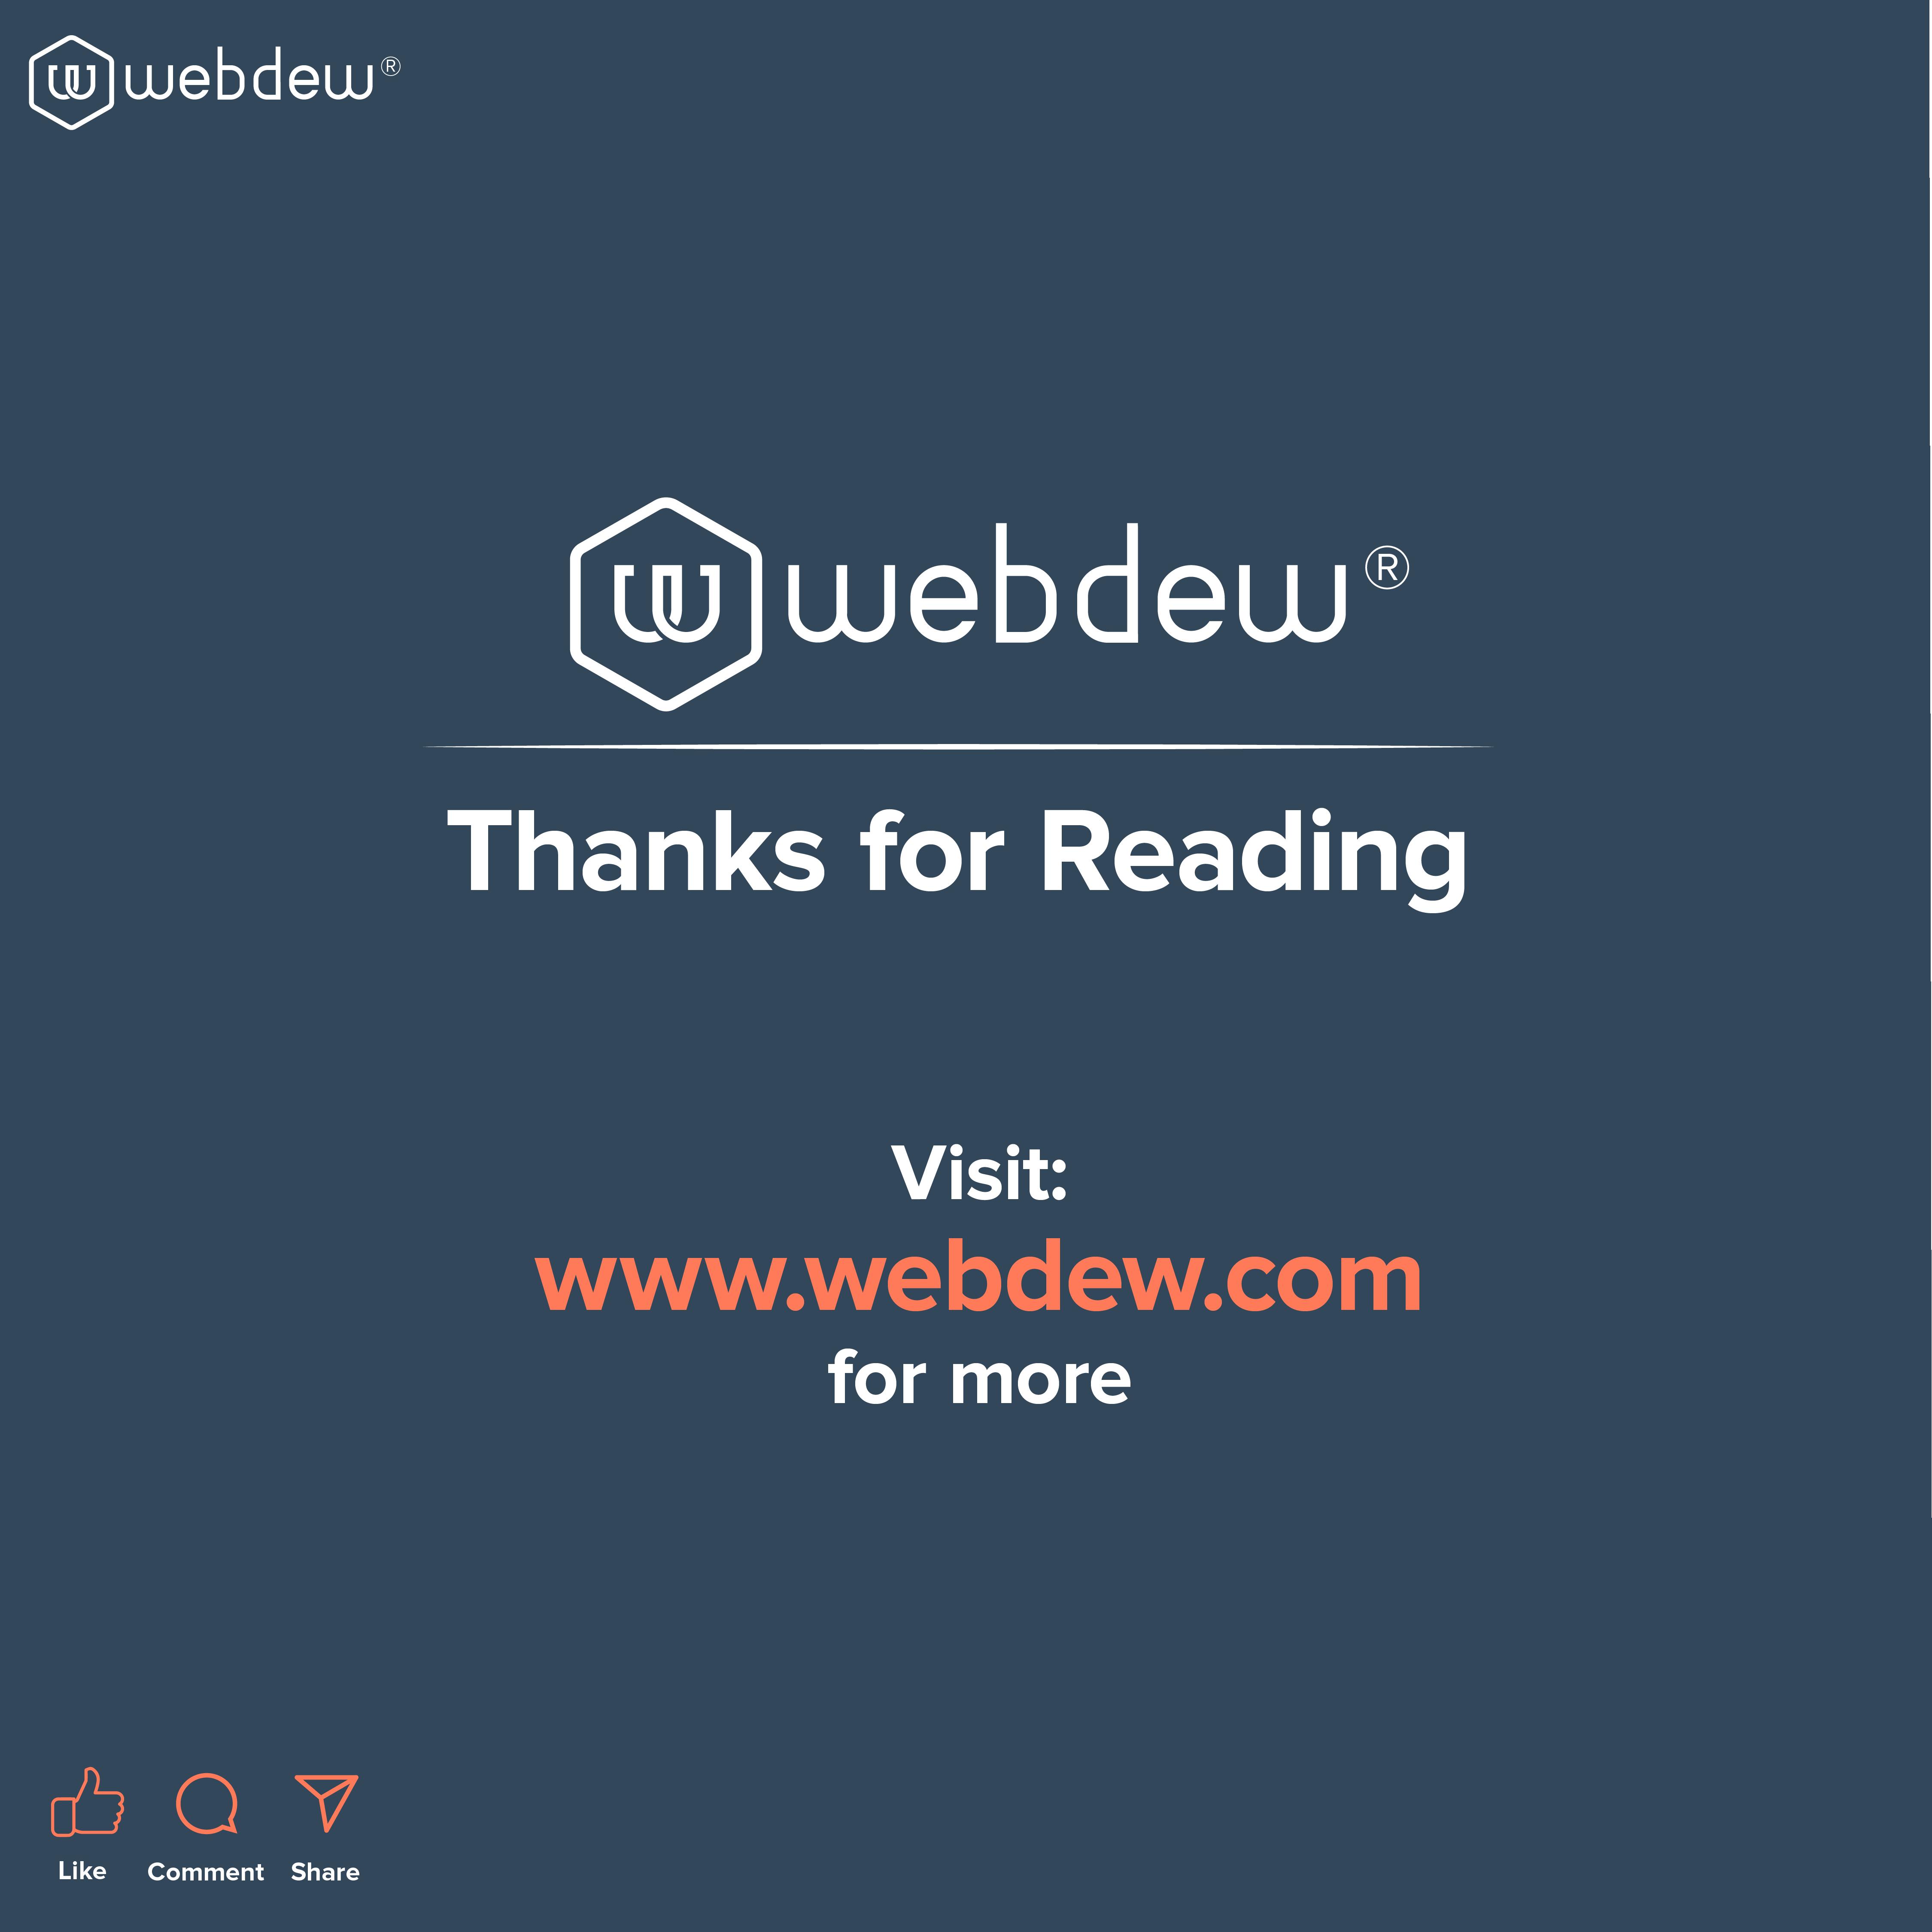 6. thanks for reading-2